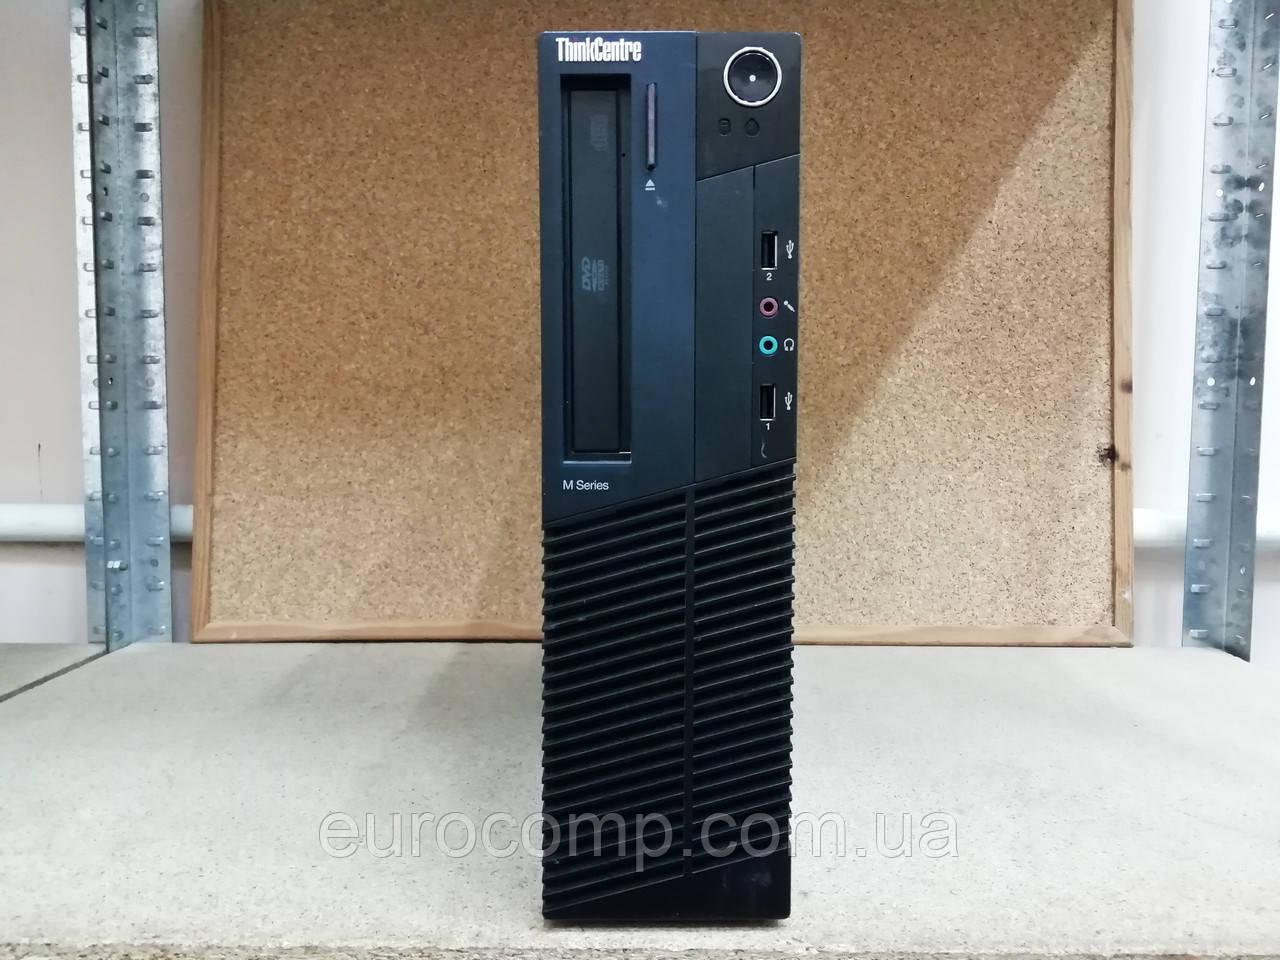 Мини компьютер для дома и офиса на Core i3-2100 Lenovo ThinkCentre M82 SFF (Лицензия Win10 Pro)